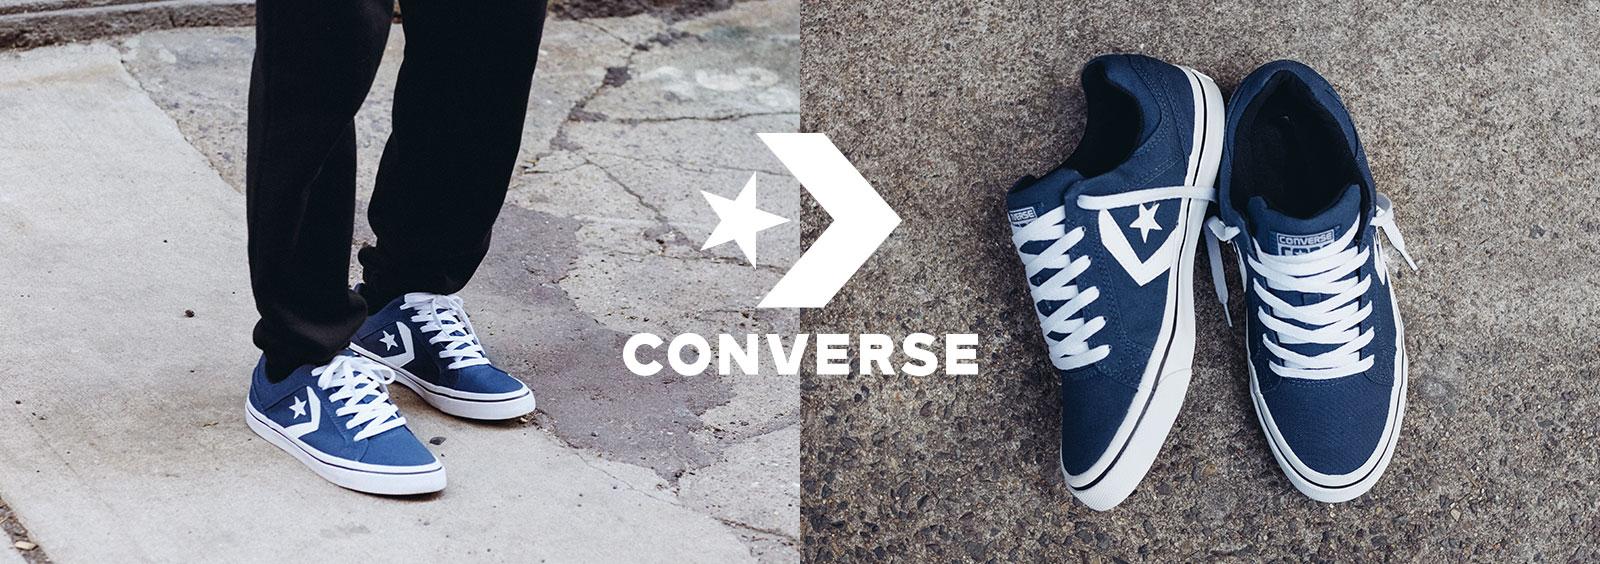 converse-footwear